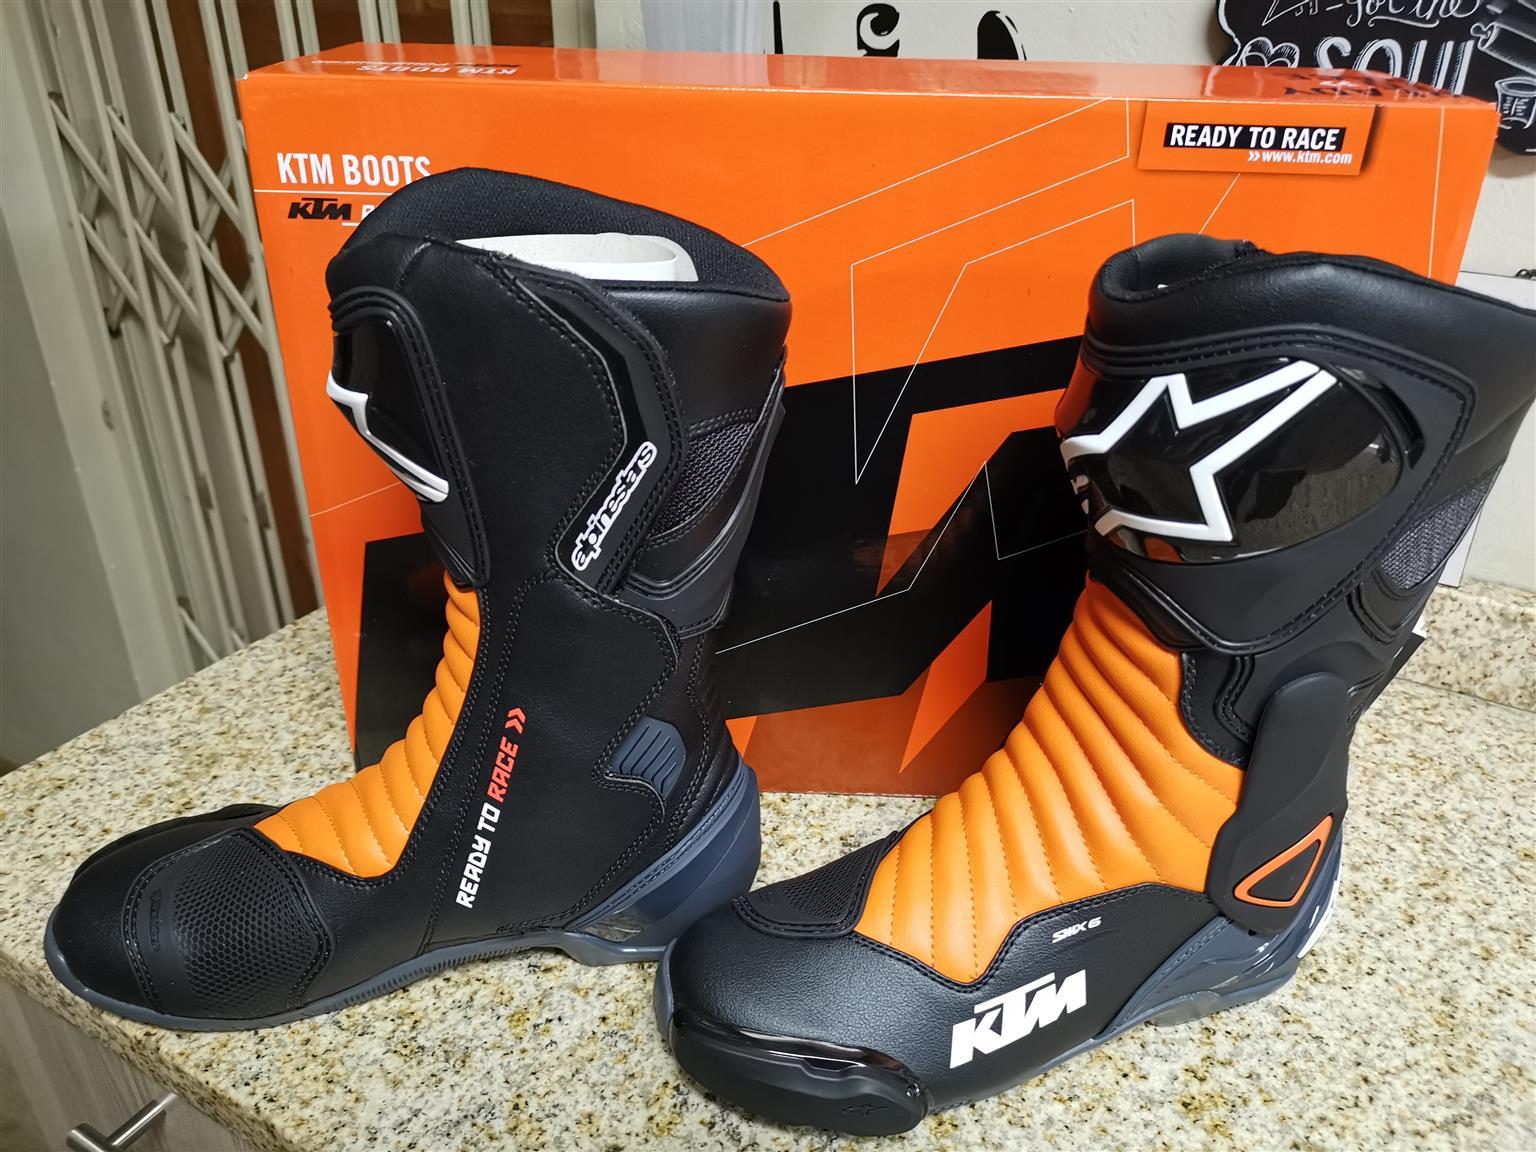 KTM Alpinestars boots